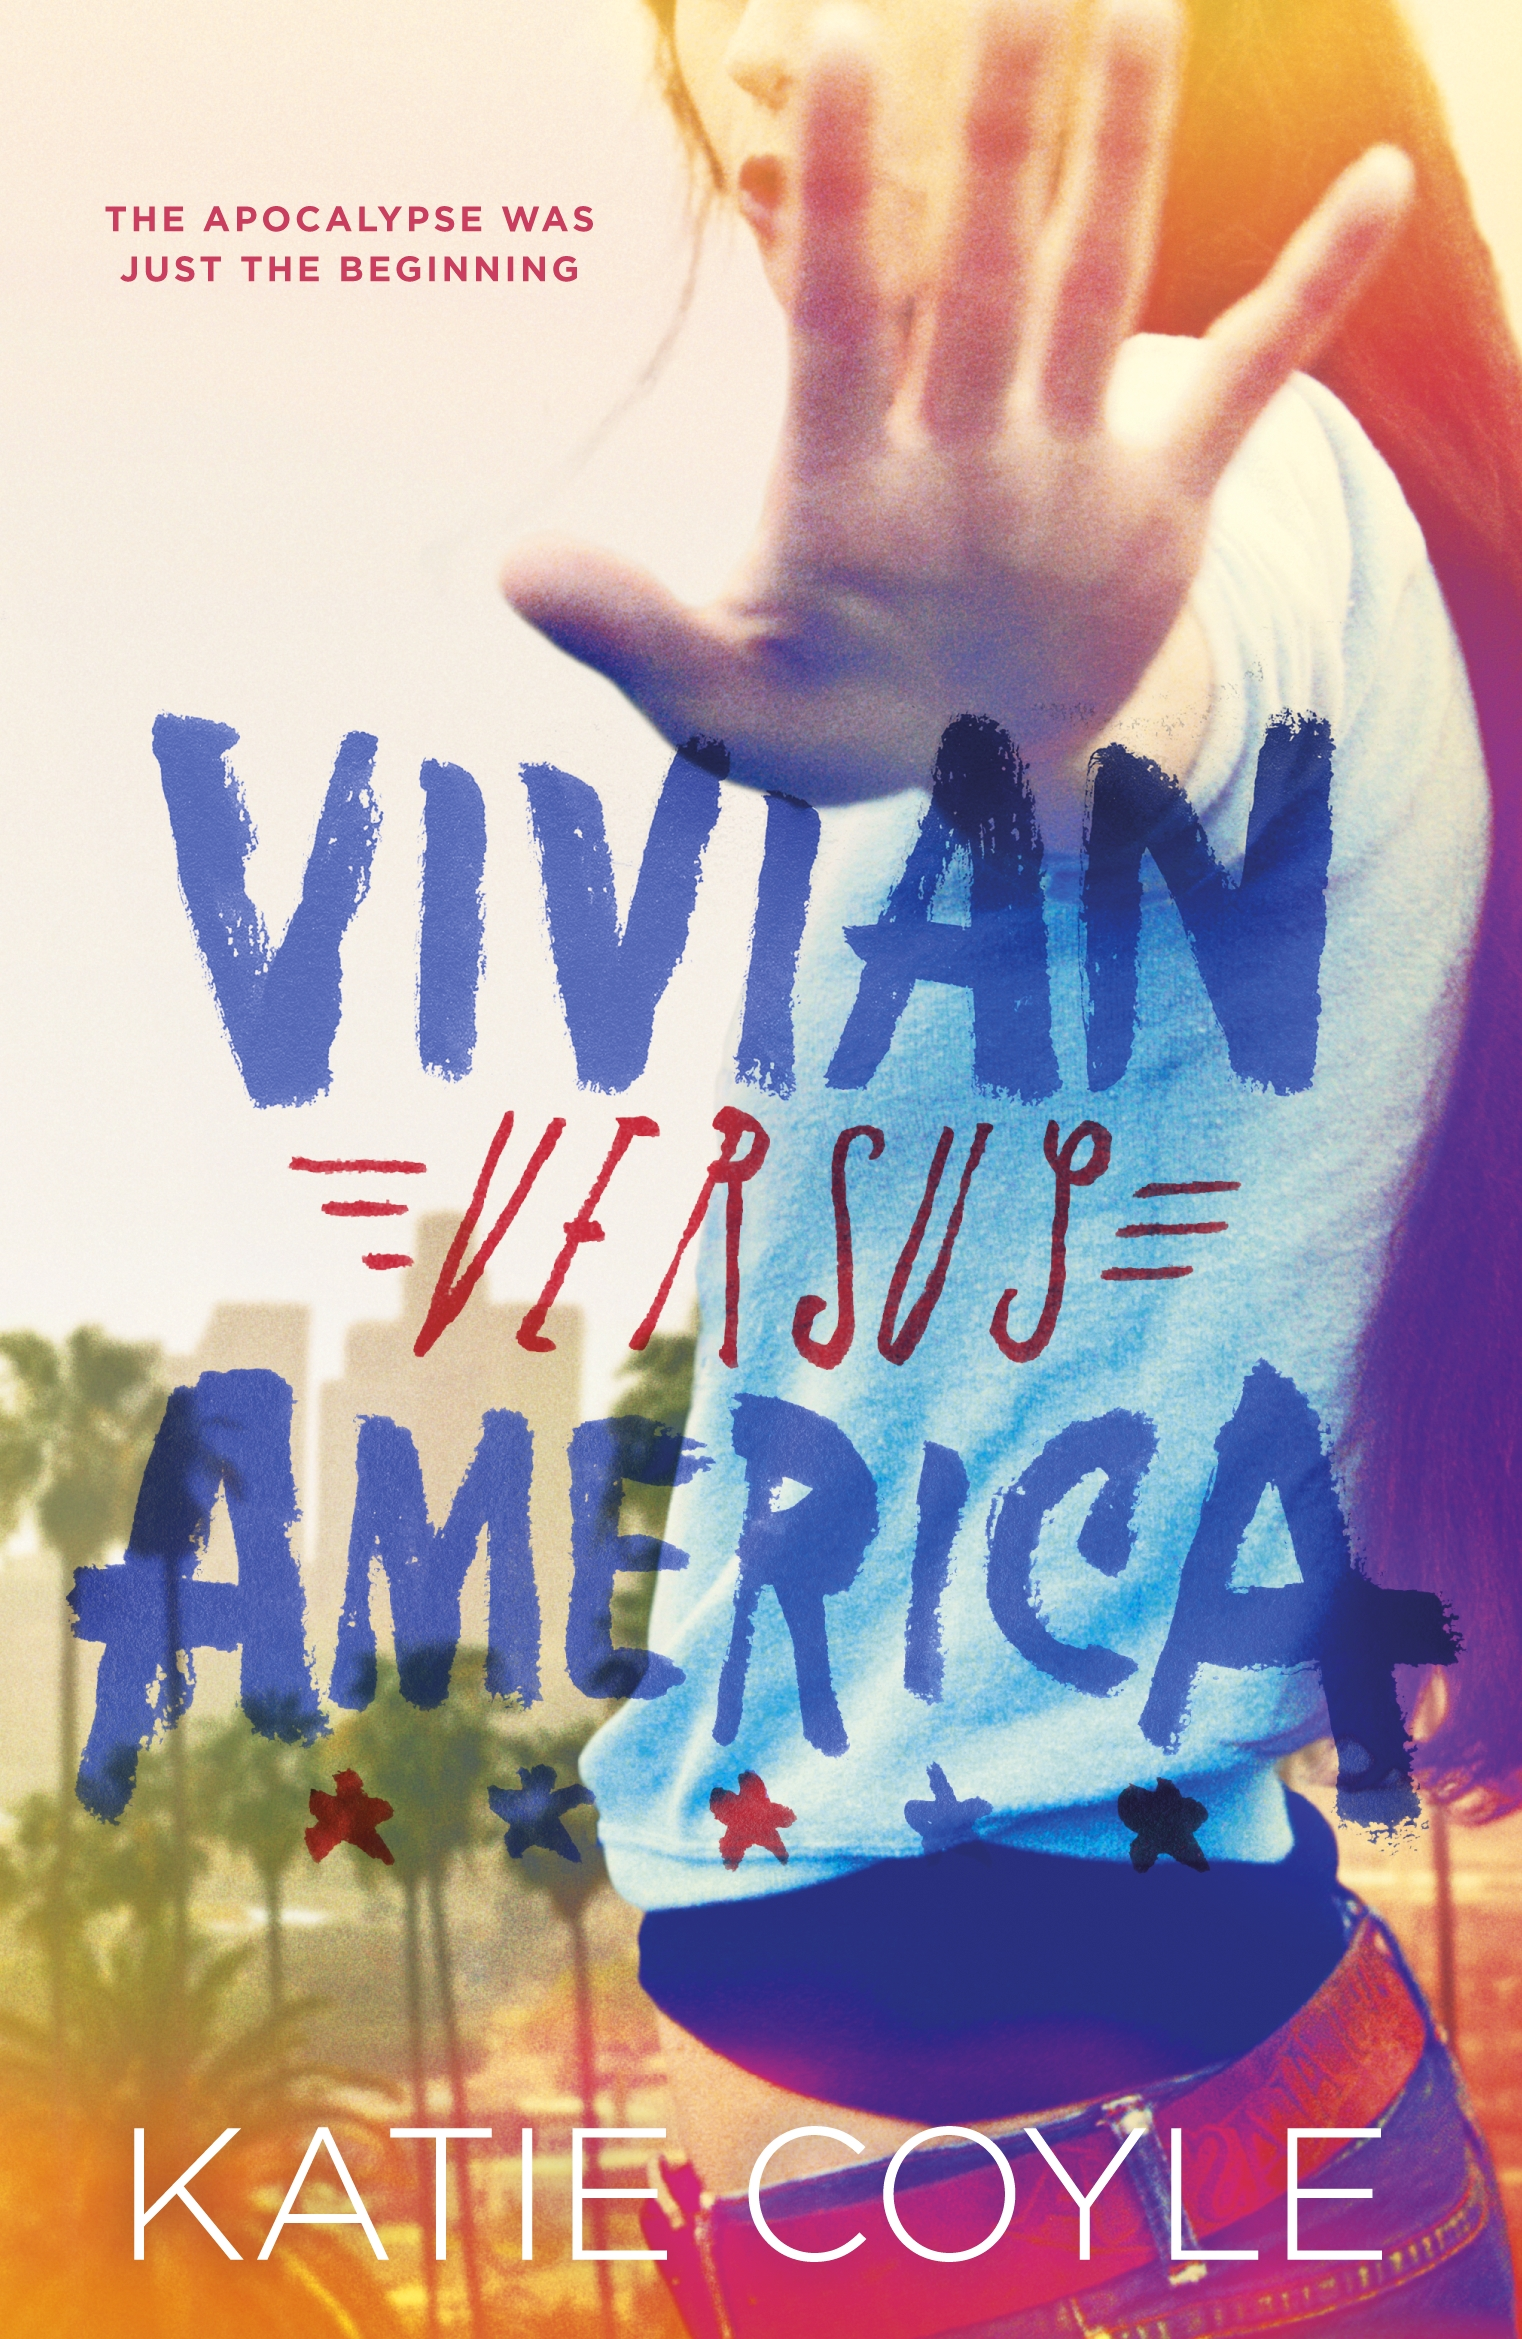 Vivian Versus America by Katie Coyle